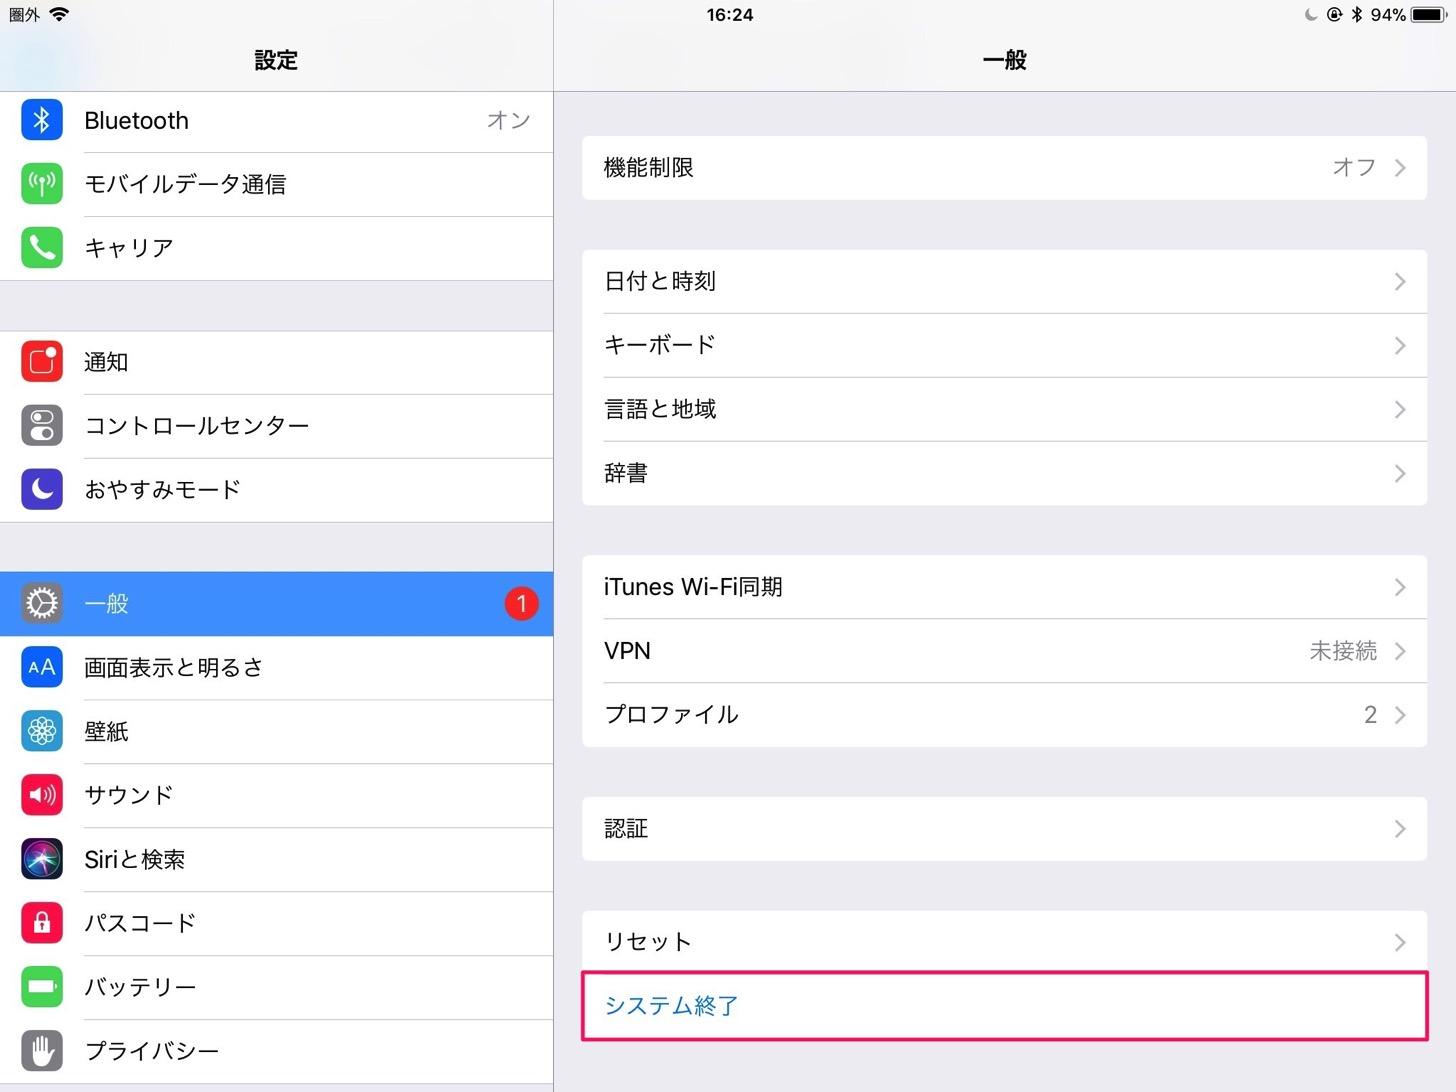 iPadの電源を設定アプリを使って切る方法。